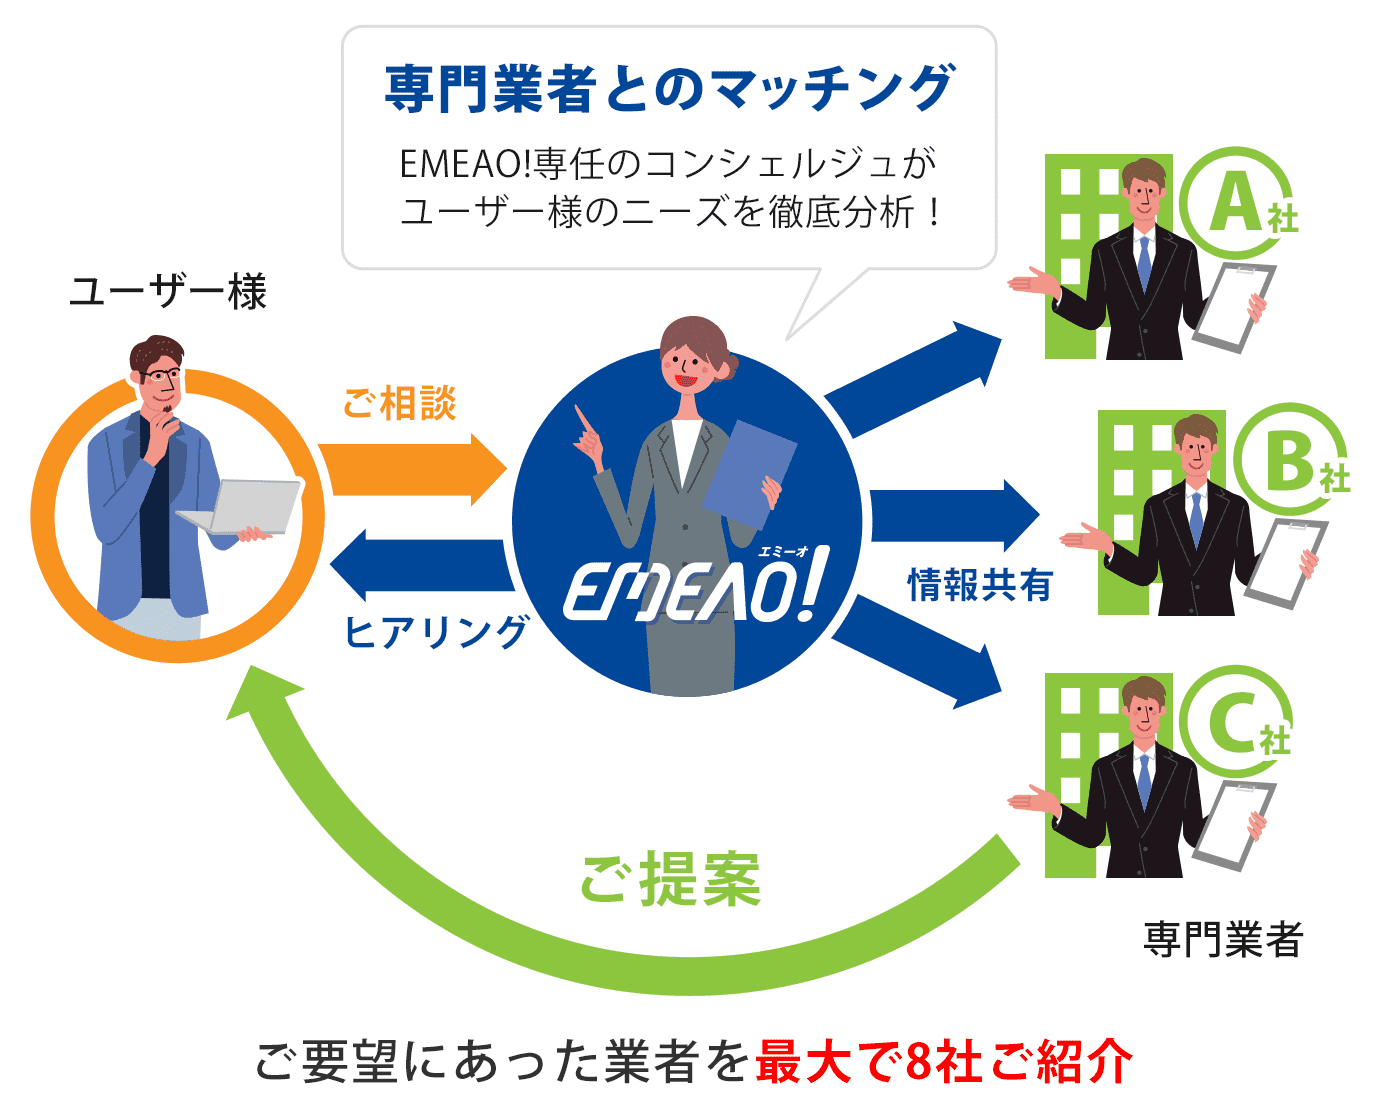 EMEAO!の仕組み